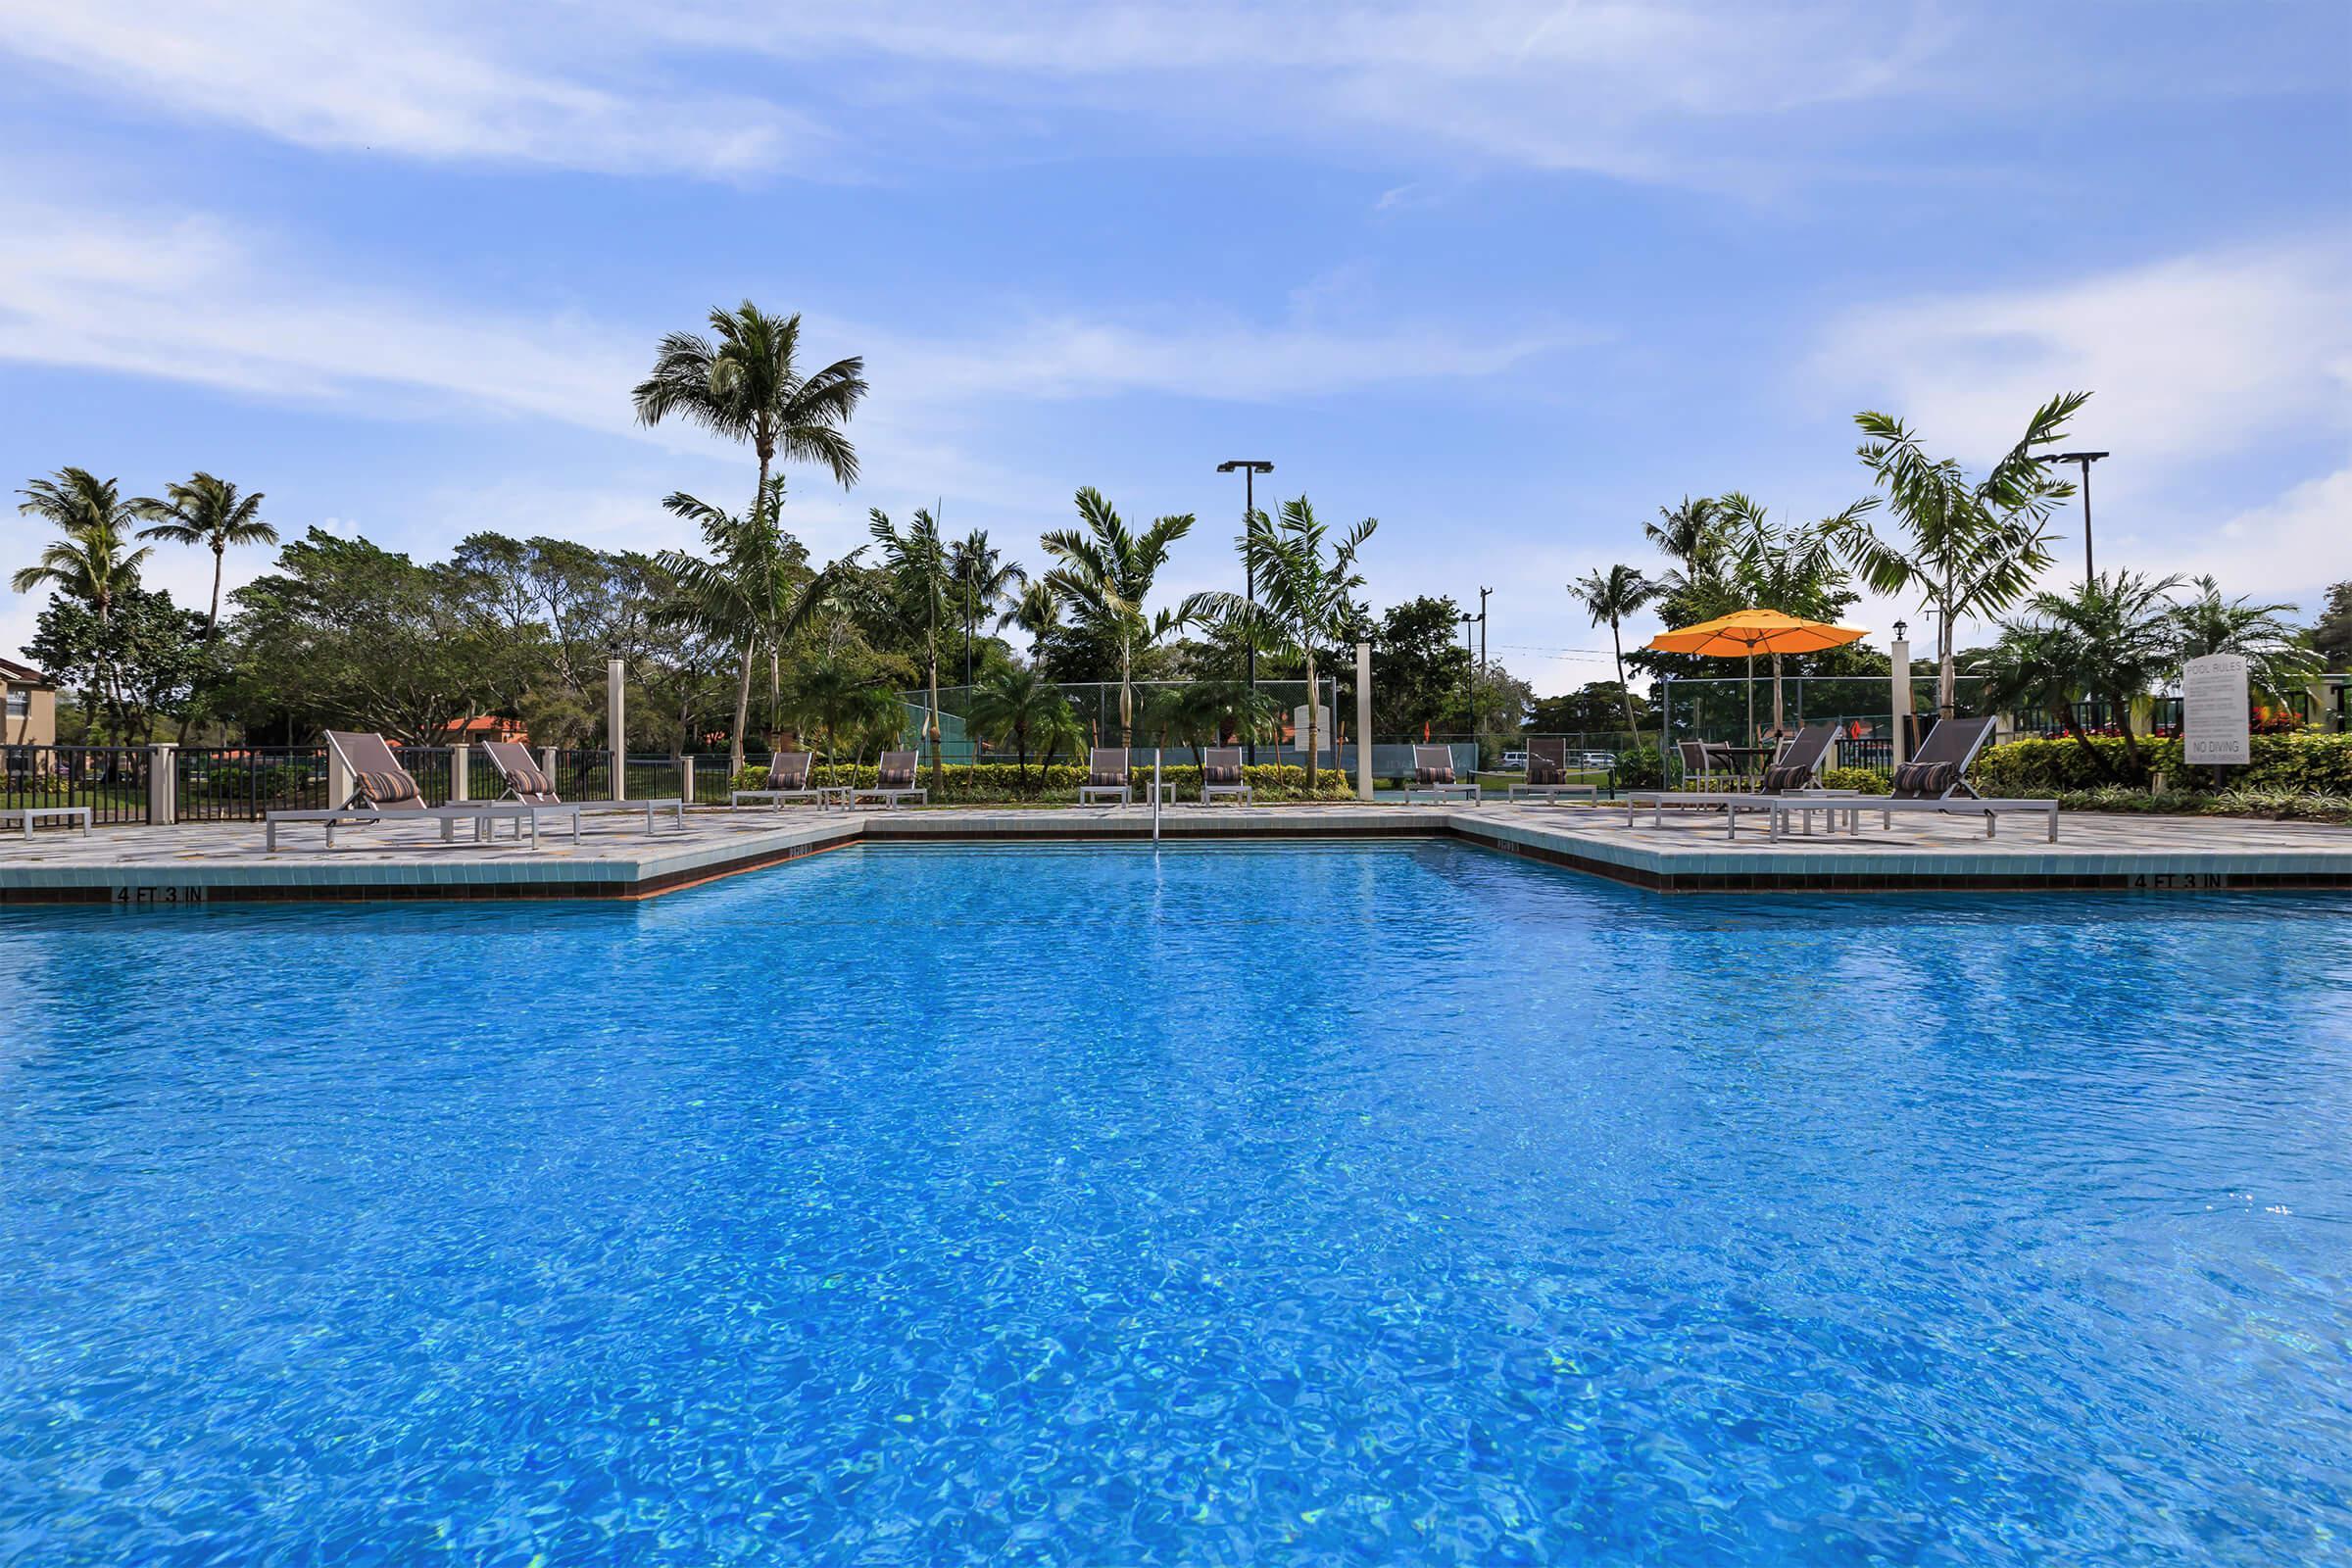 Pool at Latitude Pointe Apartments in Boynton Beach, Florida